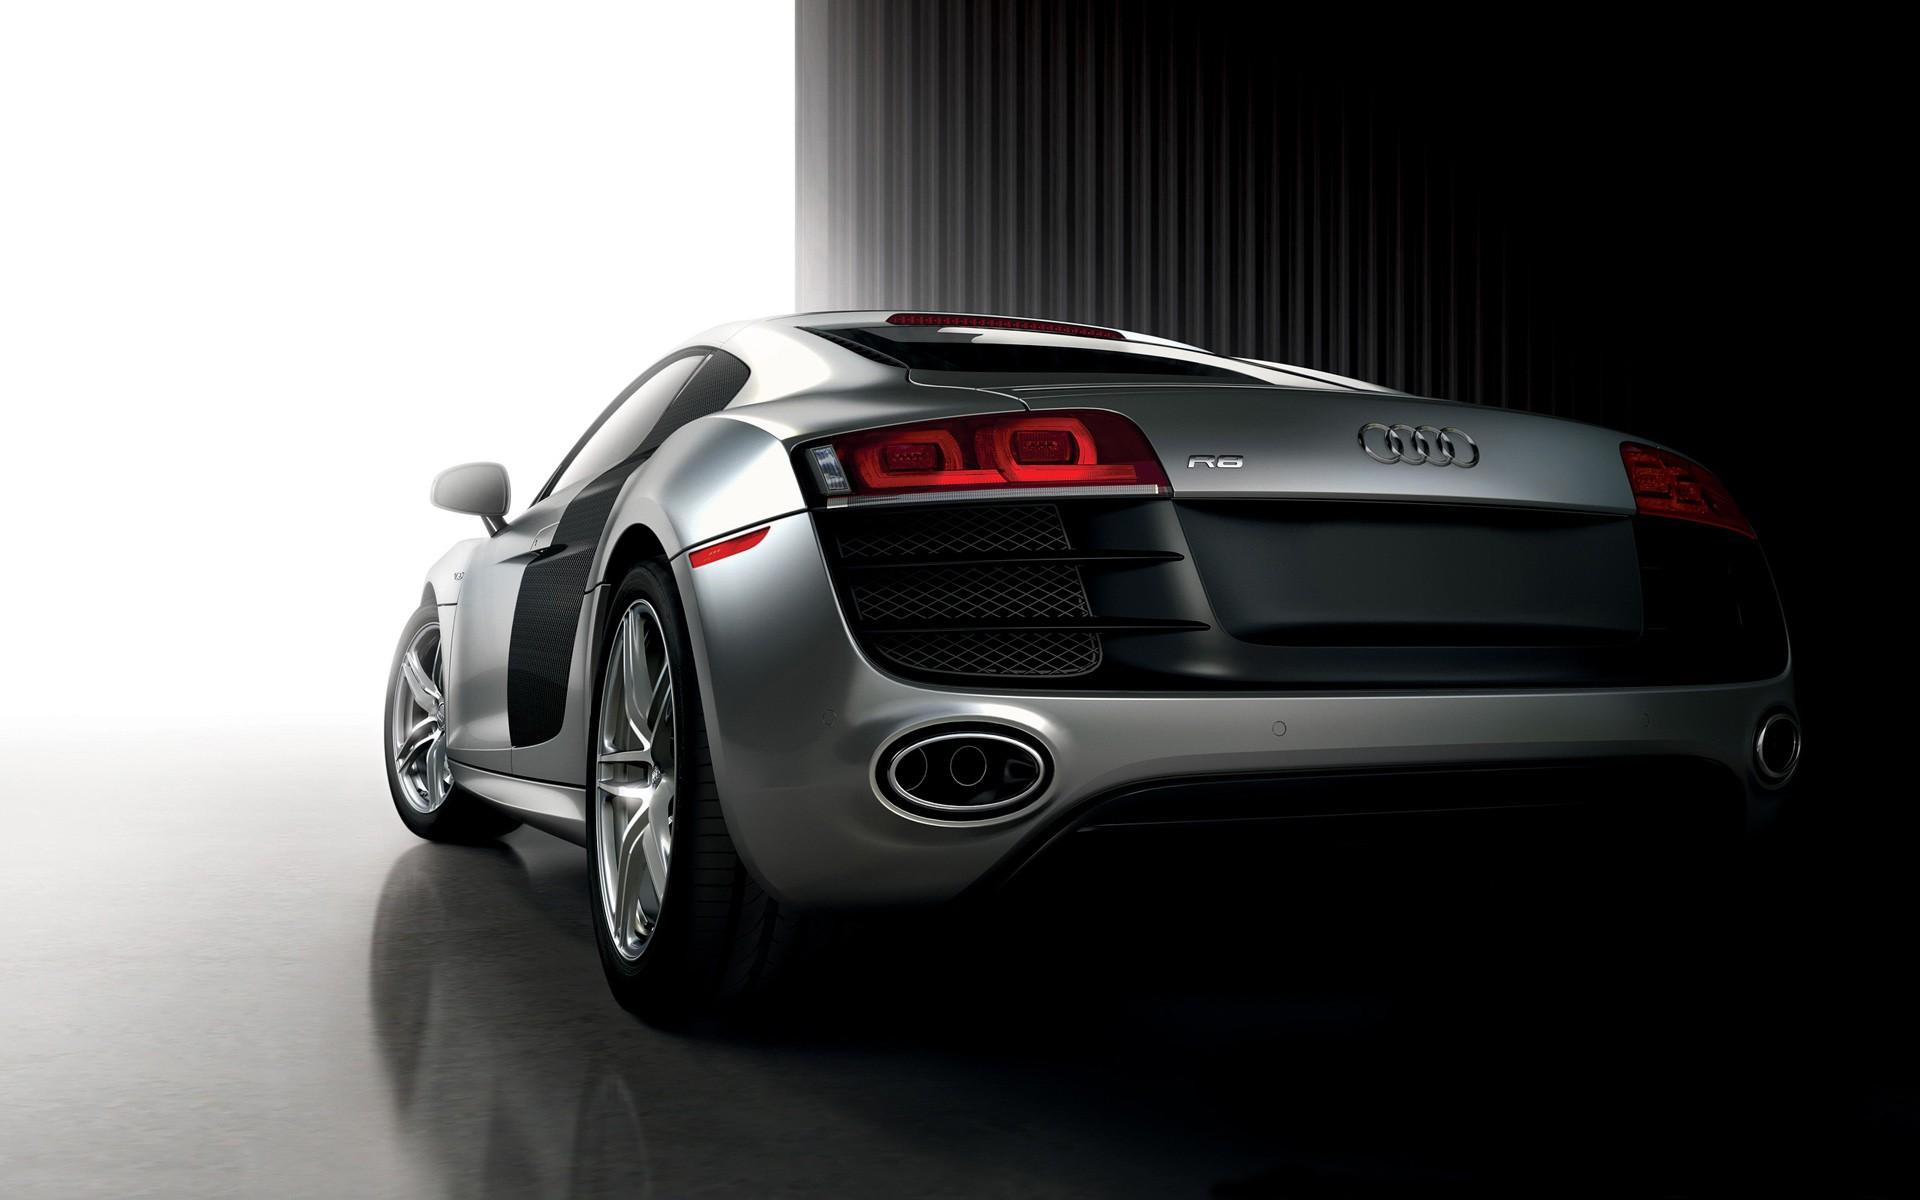 Lamborghini Super Car Wallpaper Hd Car Wallpapers Forza Motorsport 3 Xbox 360 1920x1200 Download Hd Wallpaper Wallpapertip